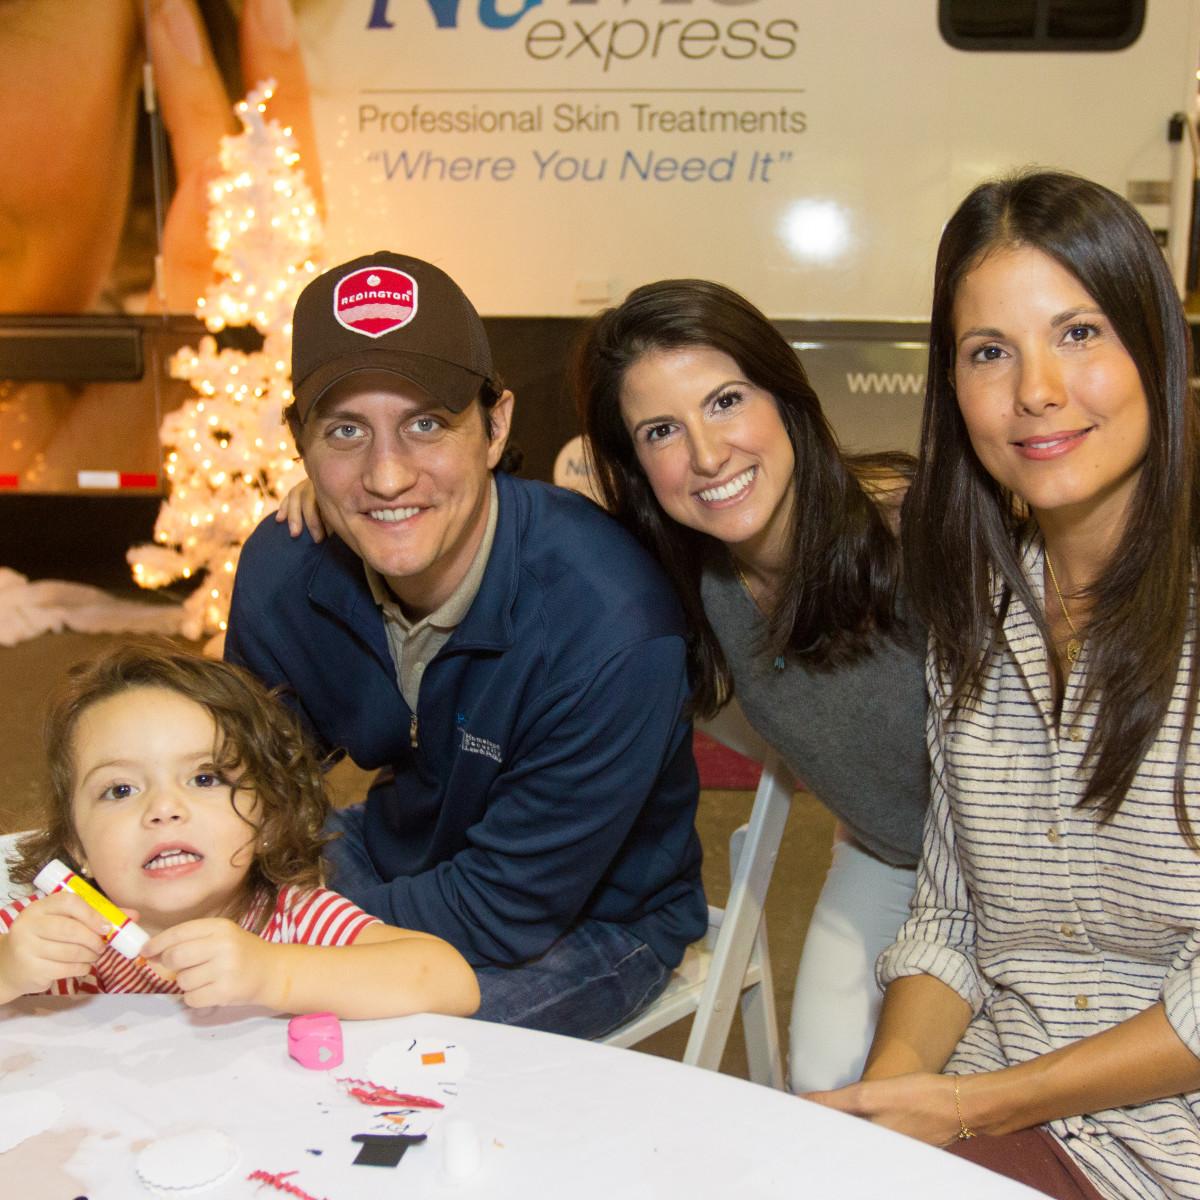 News, CM Holiday Pop-Up Shop, Dec. 2015, Ann Lucia Schinas (child), Scott Goodman, Anna Goodman, Tina Schinas